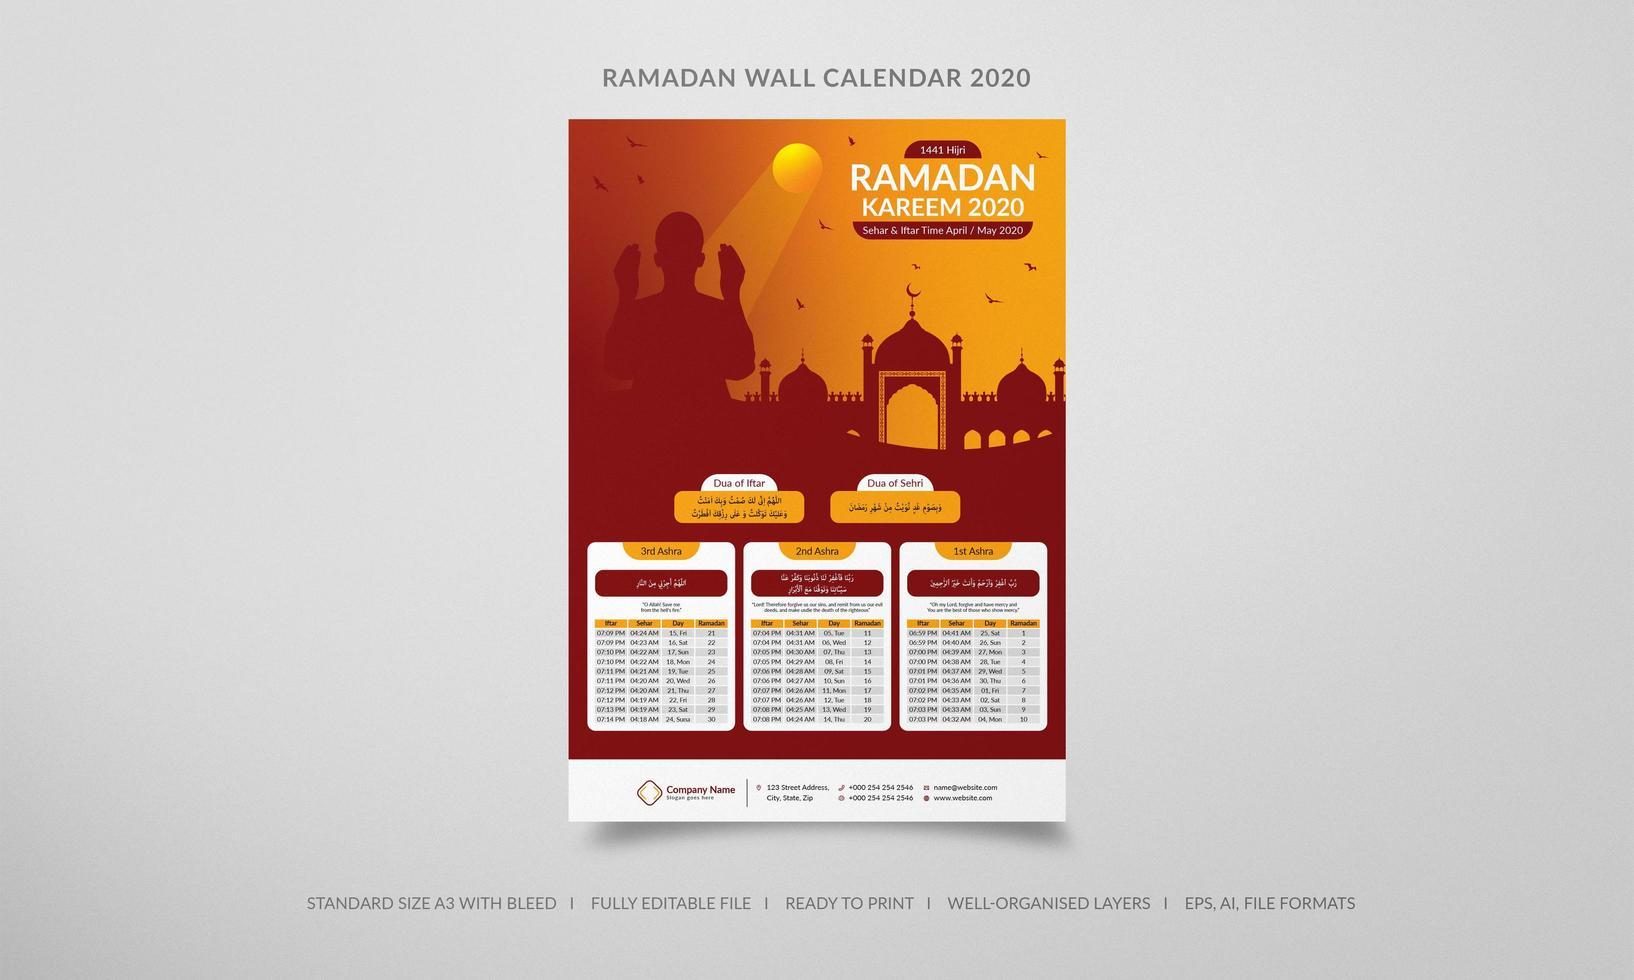 Calendrier mural ramadan 2020 silhouette orange et rouge vecteur